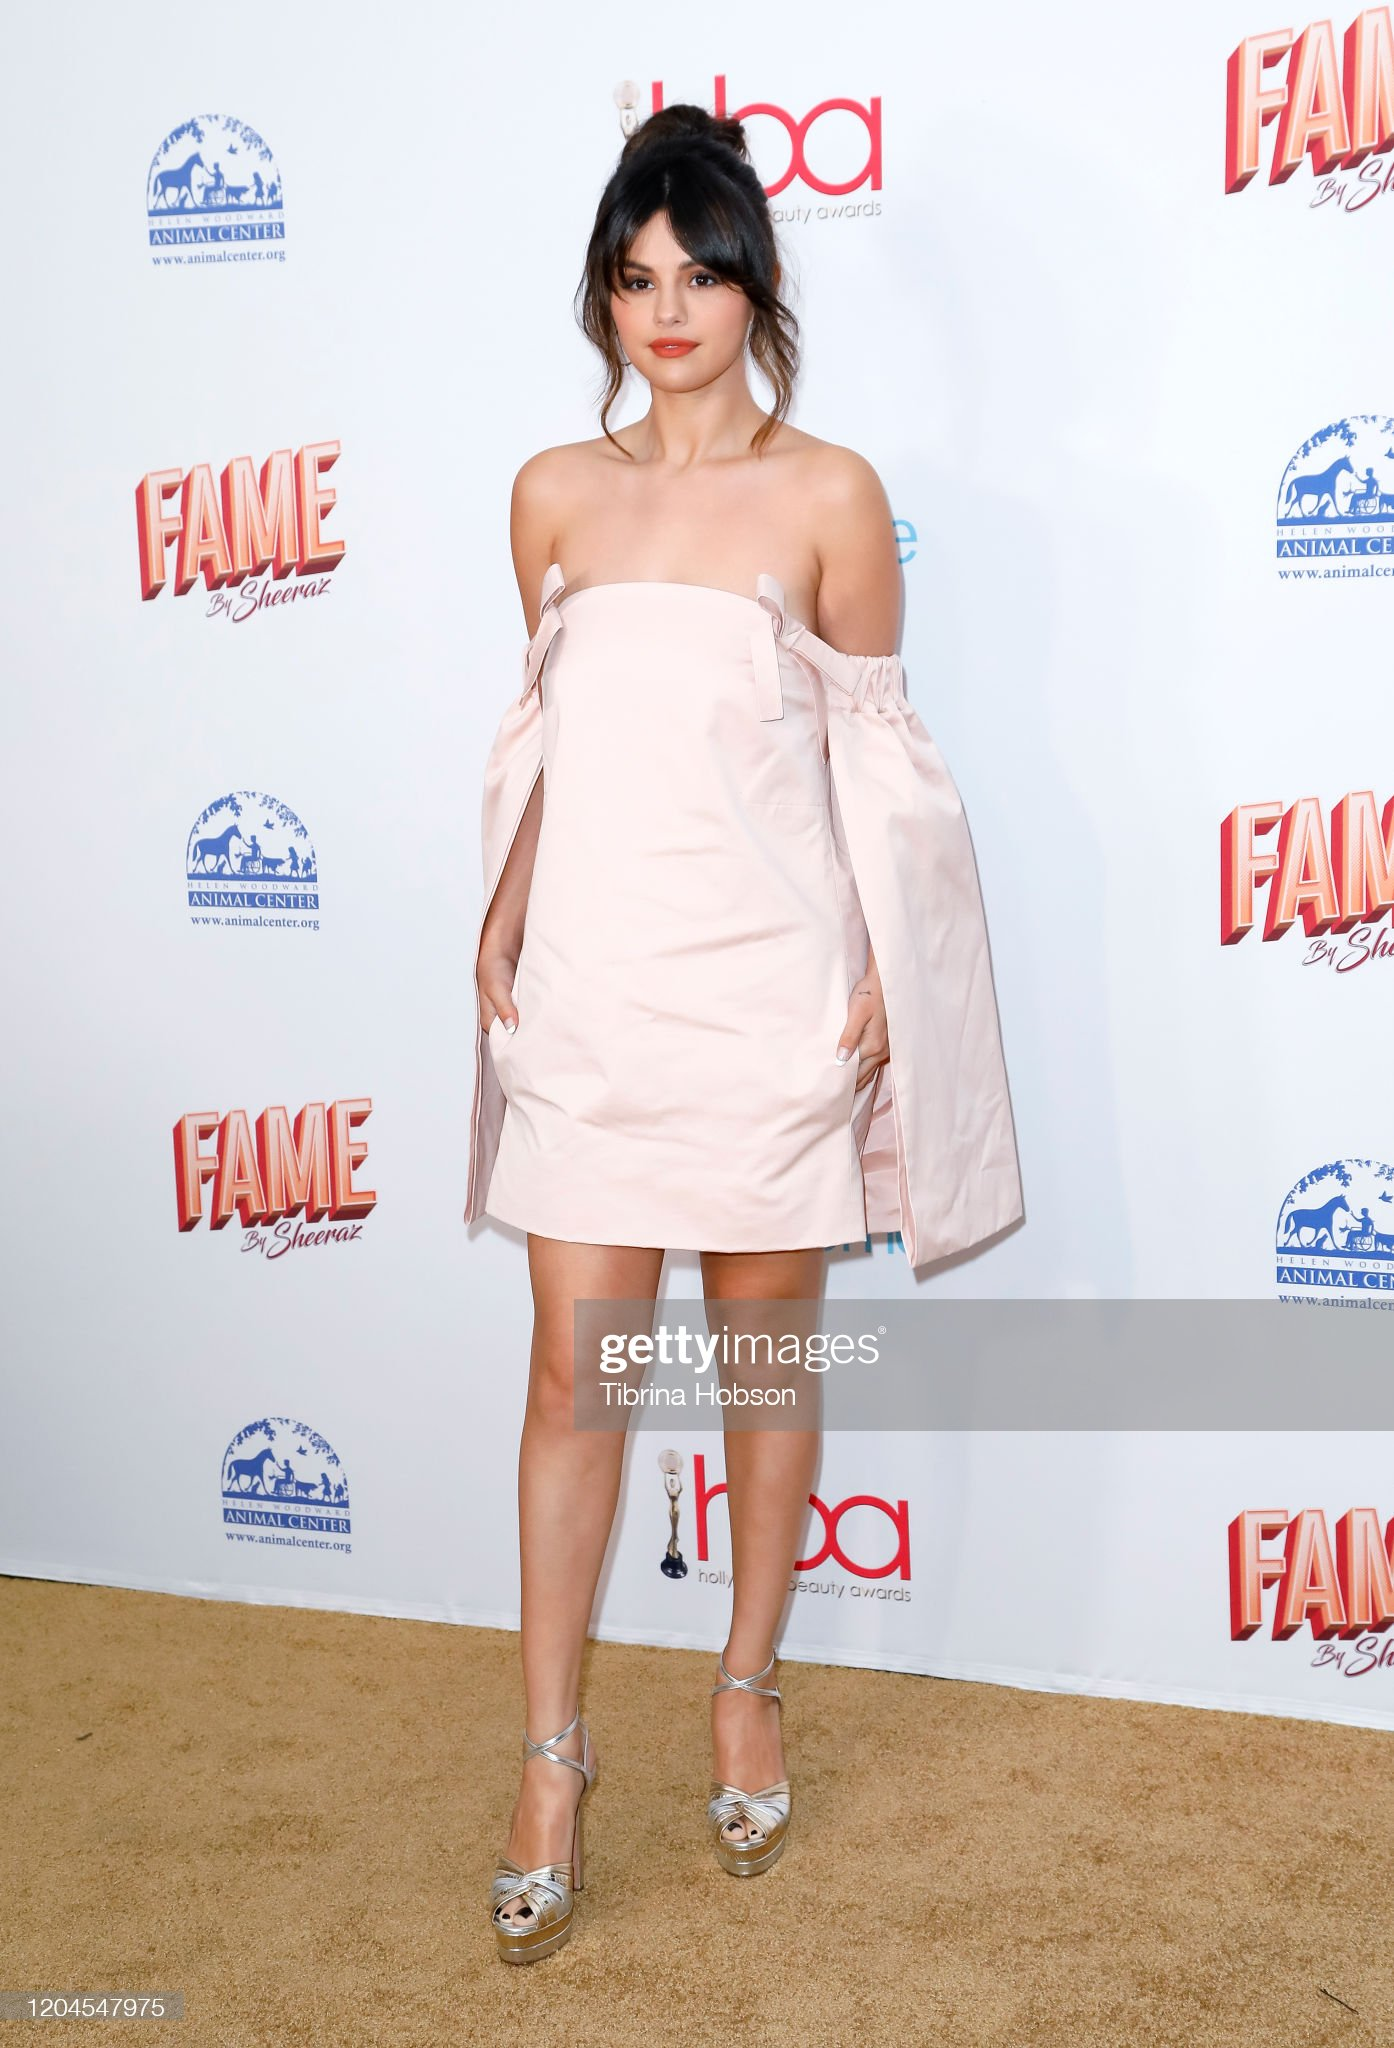 DEBATE sobre guapura de famosos y famosas - Página 5 Selena-gomez-attends-the-2020-hollywood-beauty-awards-at-the-taglyan-picture-id1204547975?s=2048x2048